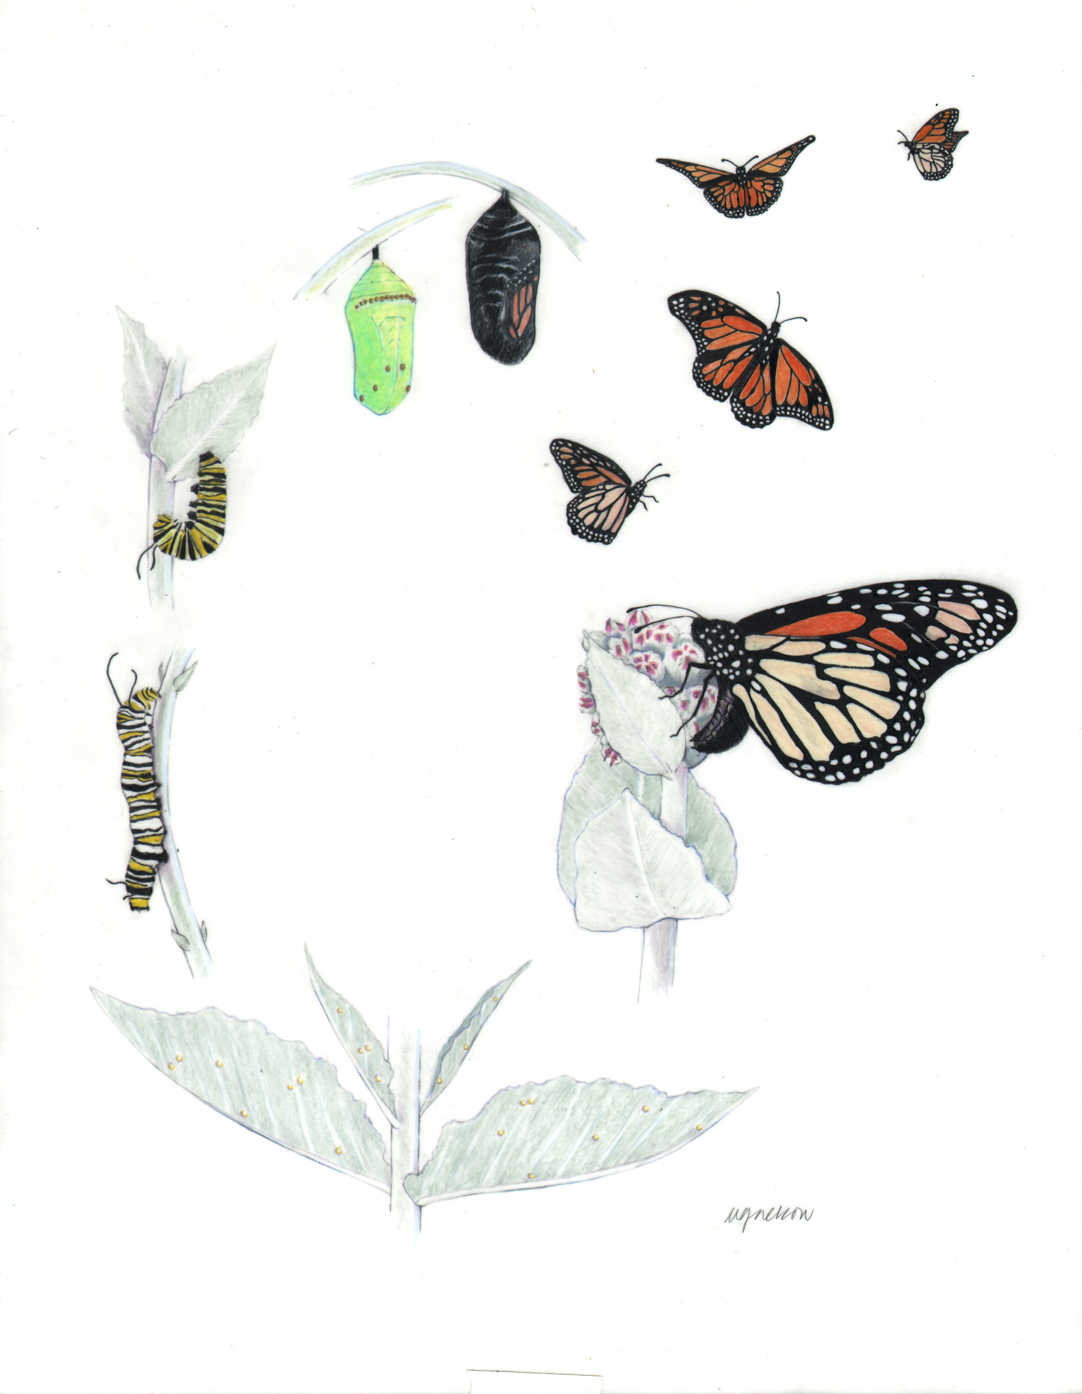 Monarch butterfly (Danaus plexippus) and Milkweed (Asclepias californica)